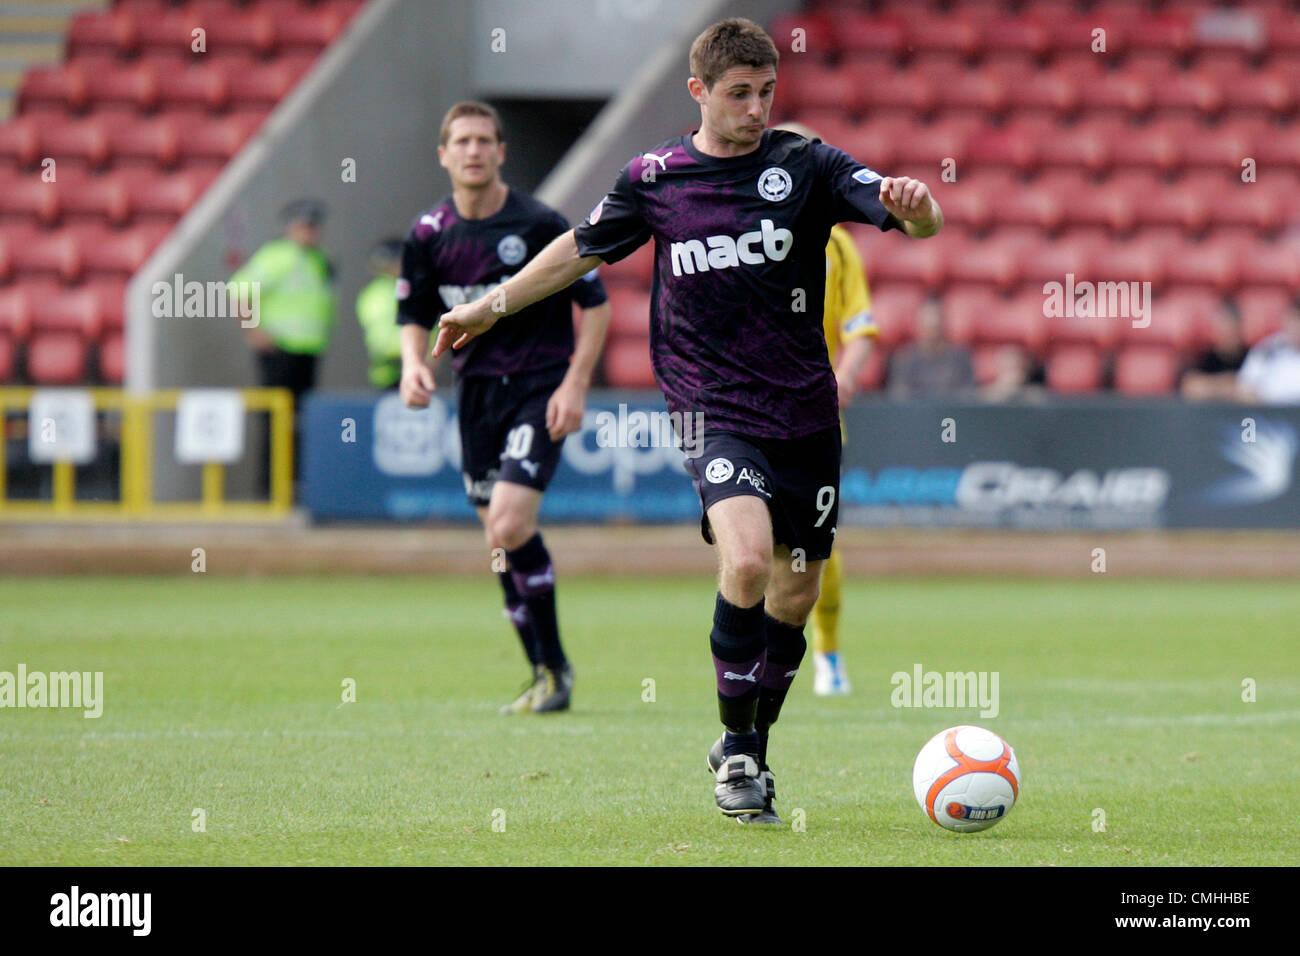 11th Aug 2012. 11.08.2012 Glasgow, Scotland.  9 Kris Doolan in action during the Scottish Football League Division - Stock Image